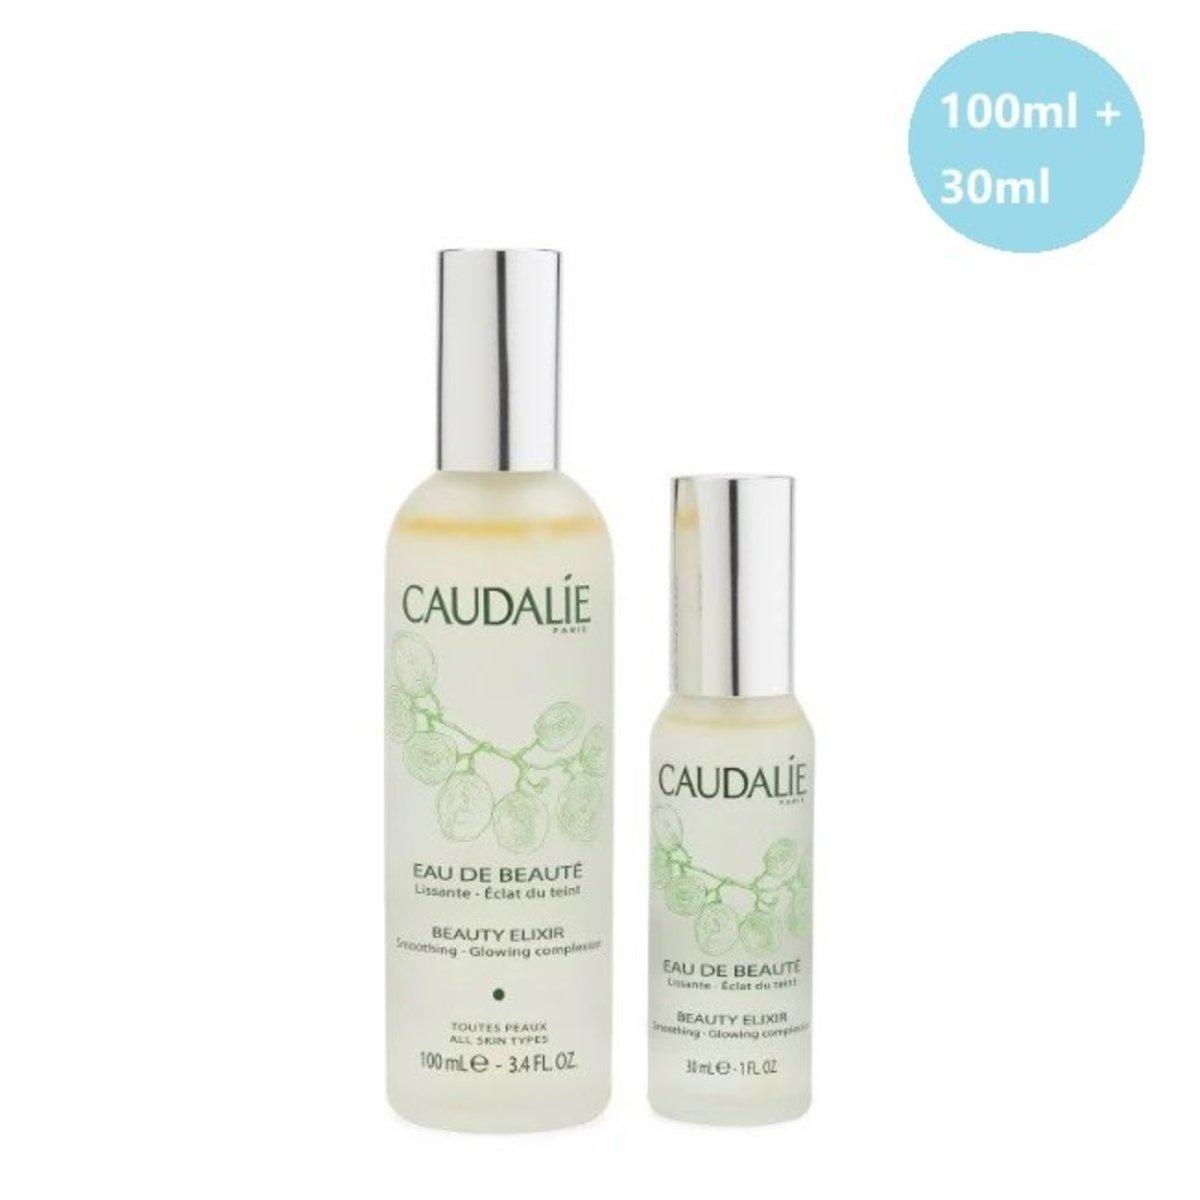 Beauty Elixir Duo 100ml+30ml (3522930021537) (Parallel Import)